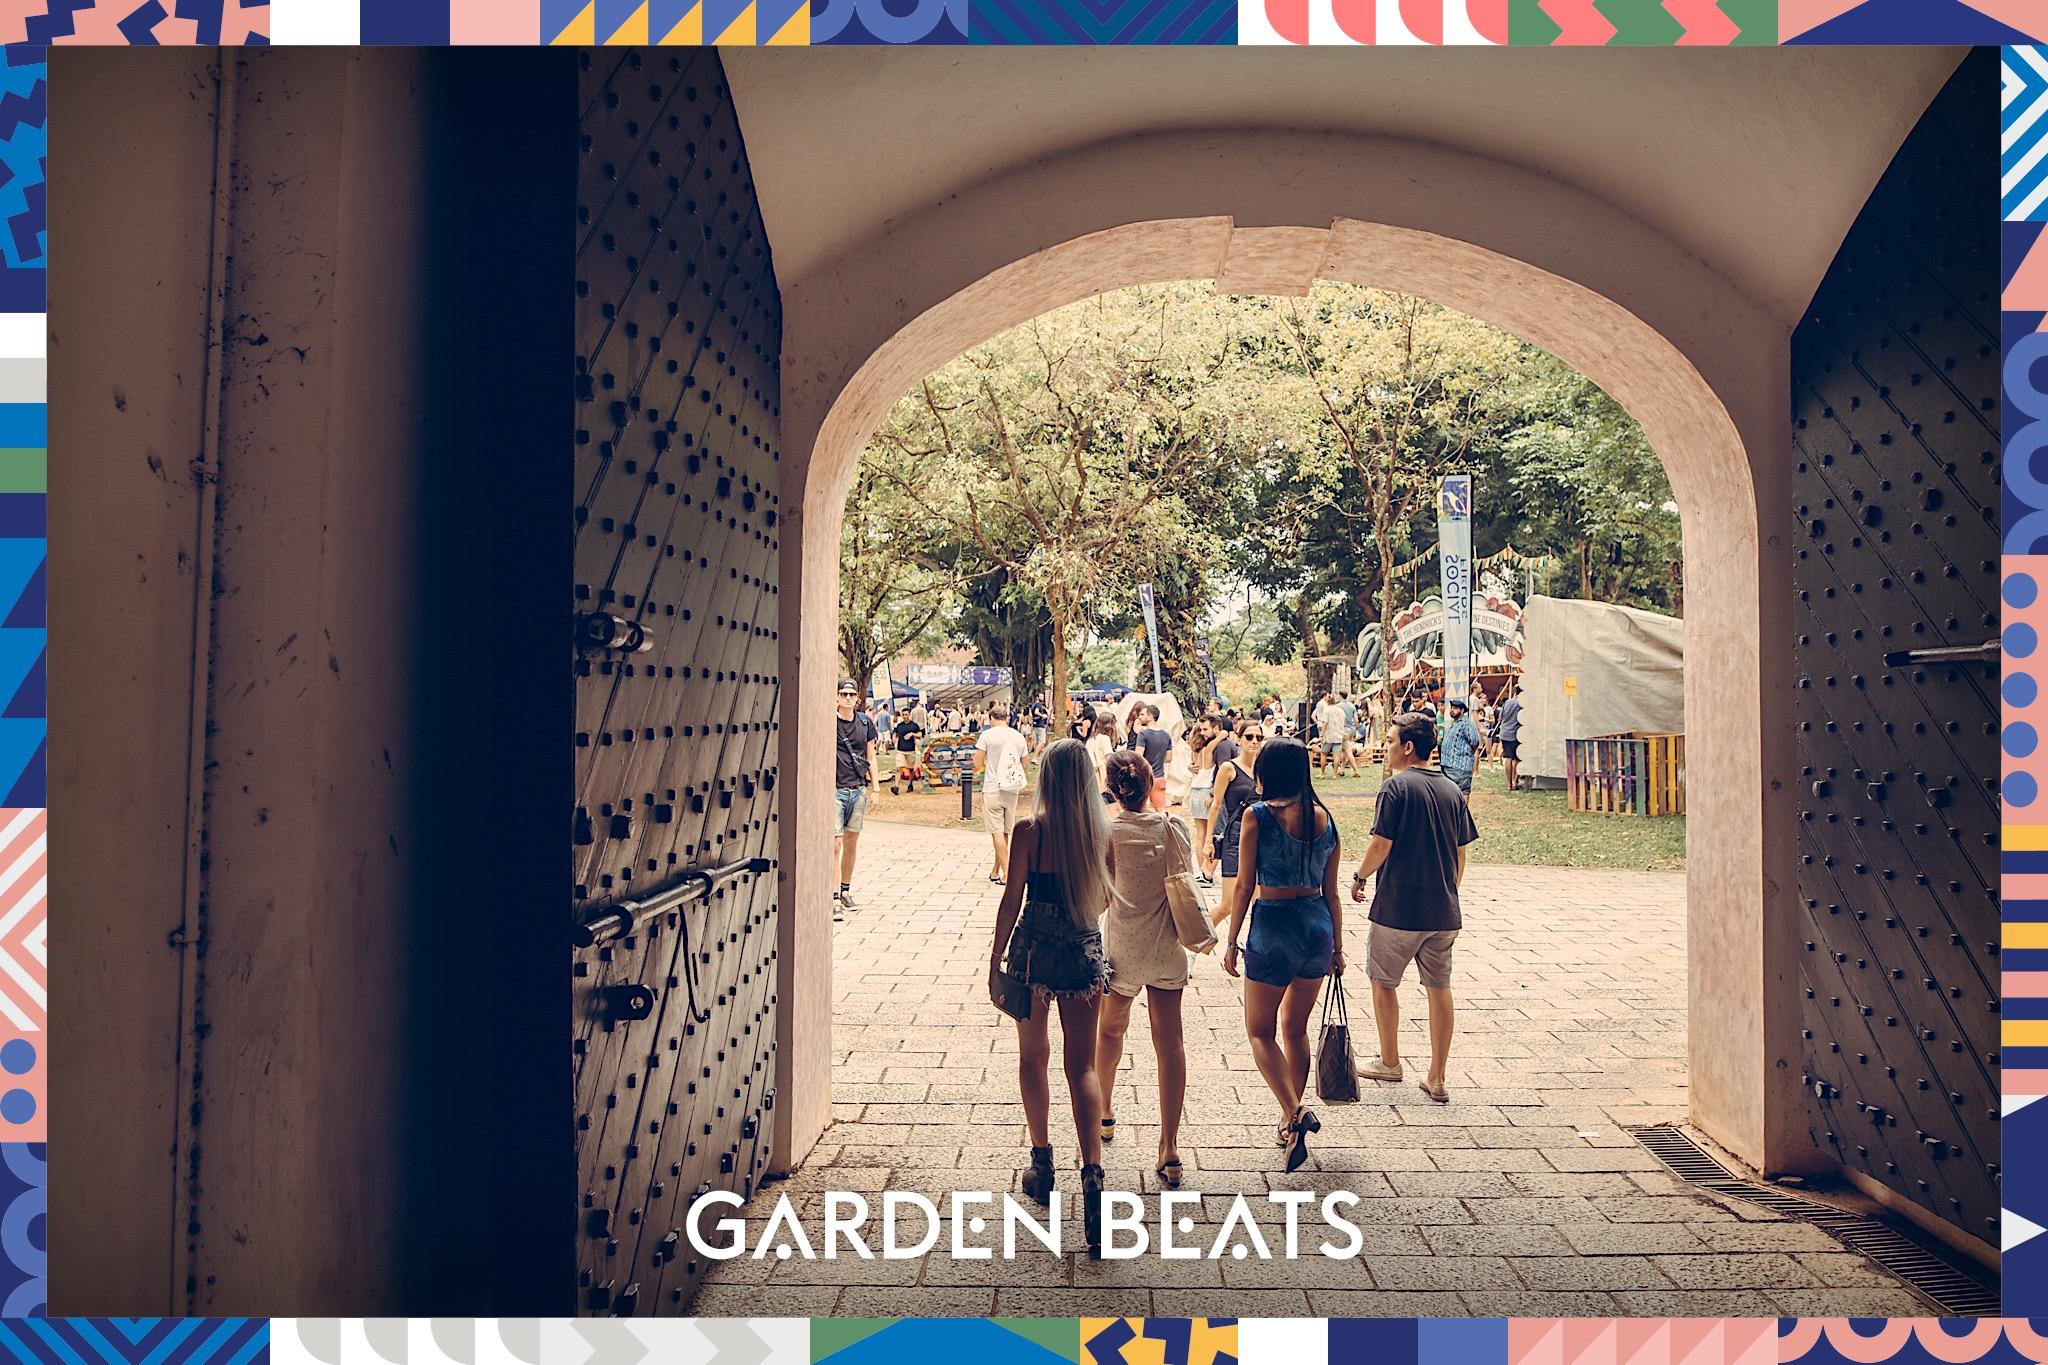 03032018_GardenBeats_Colossal516_Watermarked.jpg